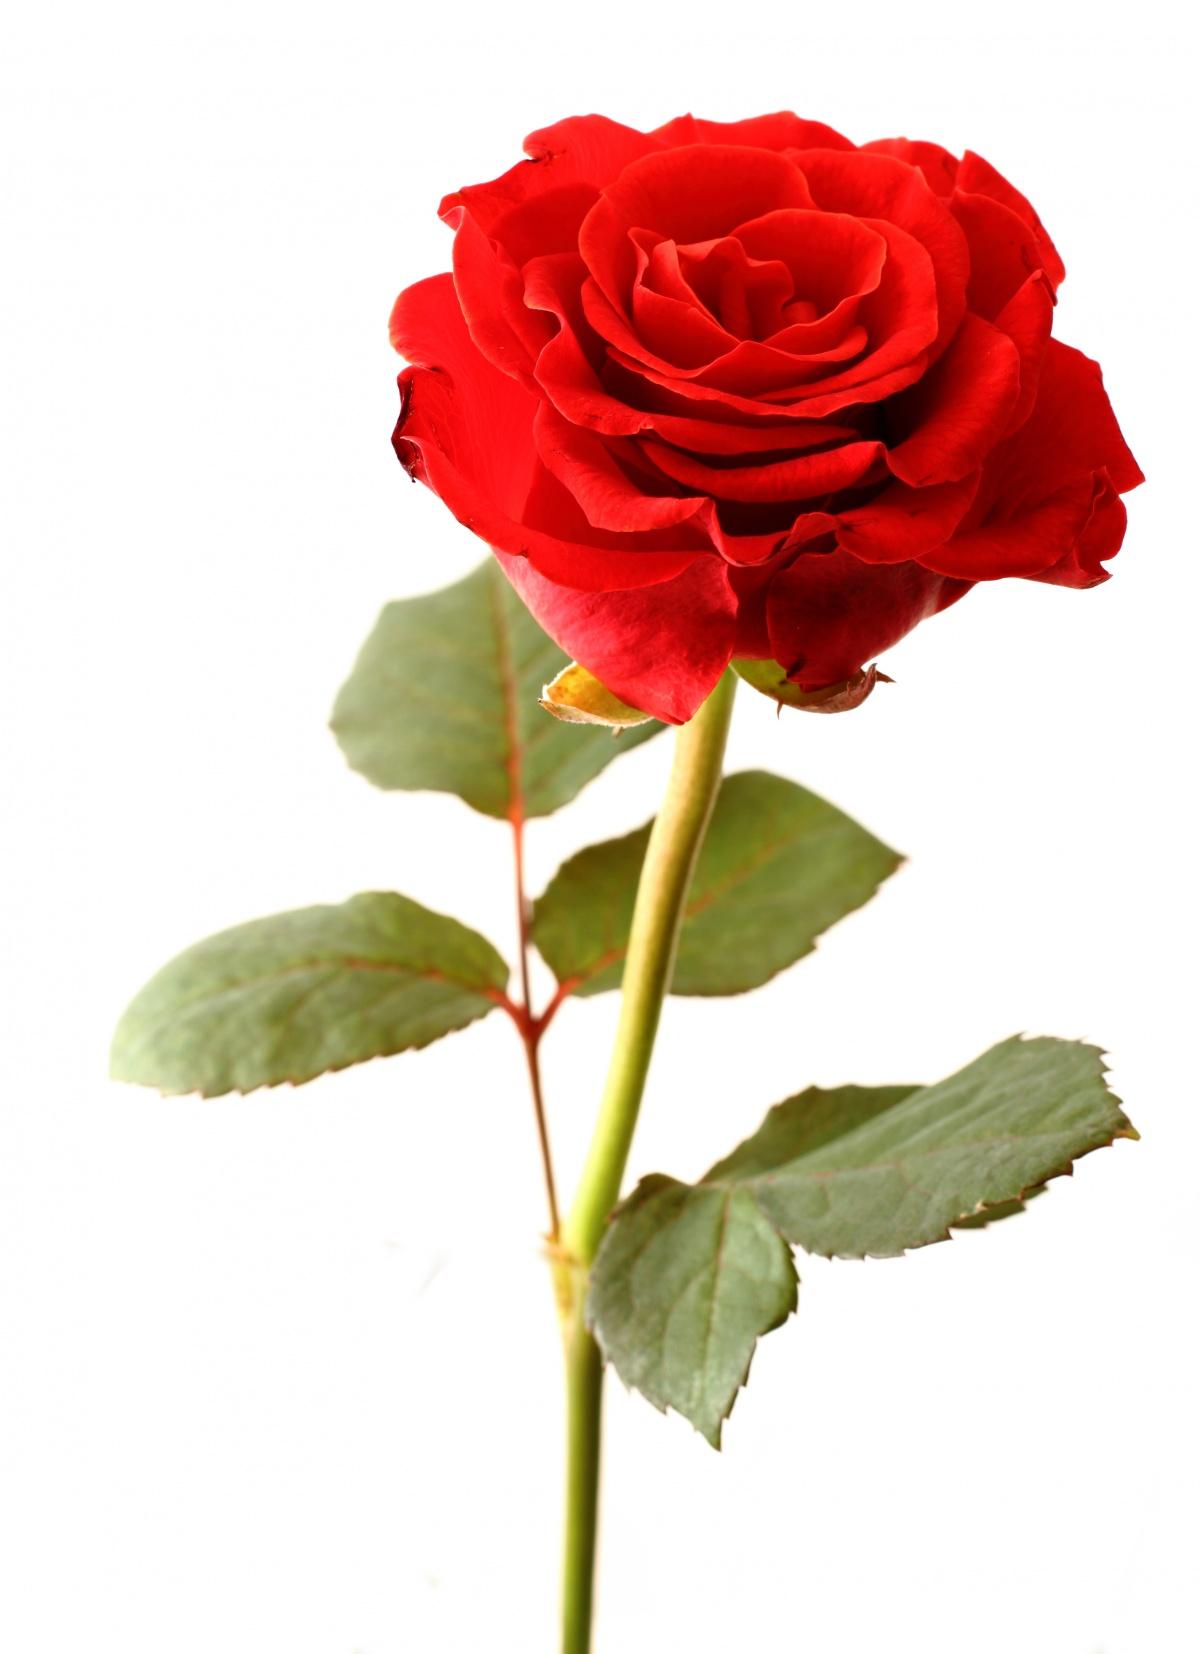 Regalame una flor.  - Página 15 Rosaroja